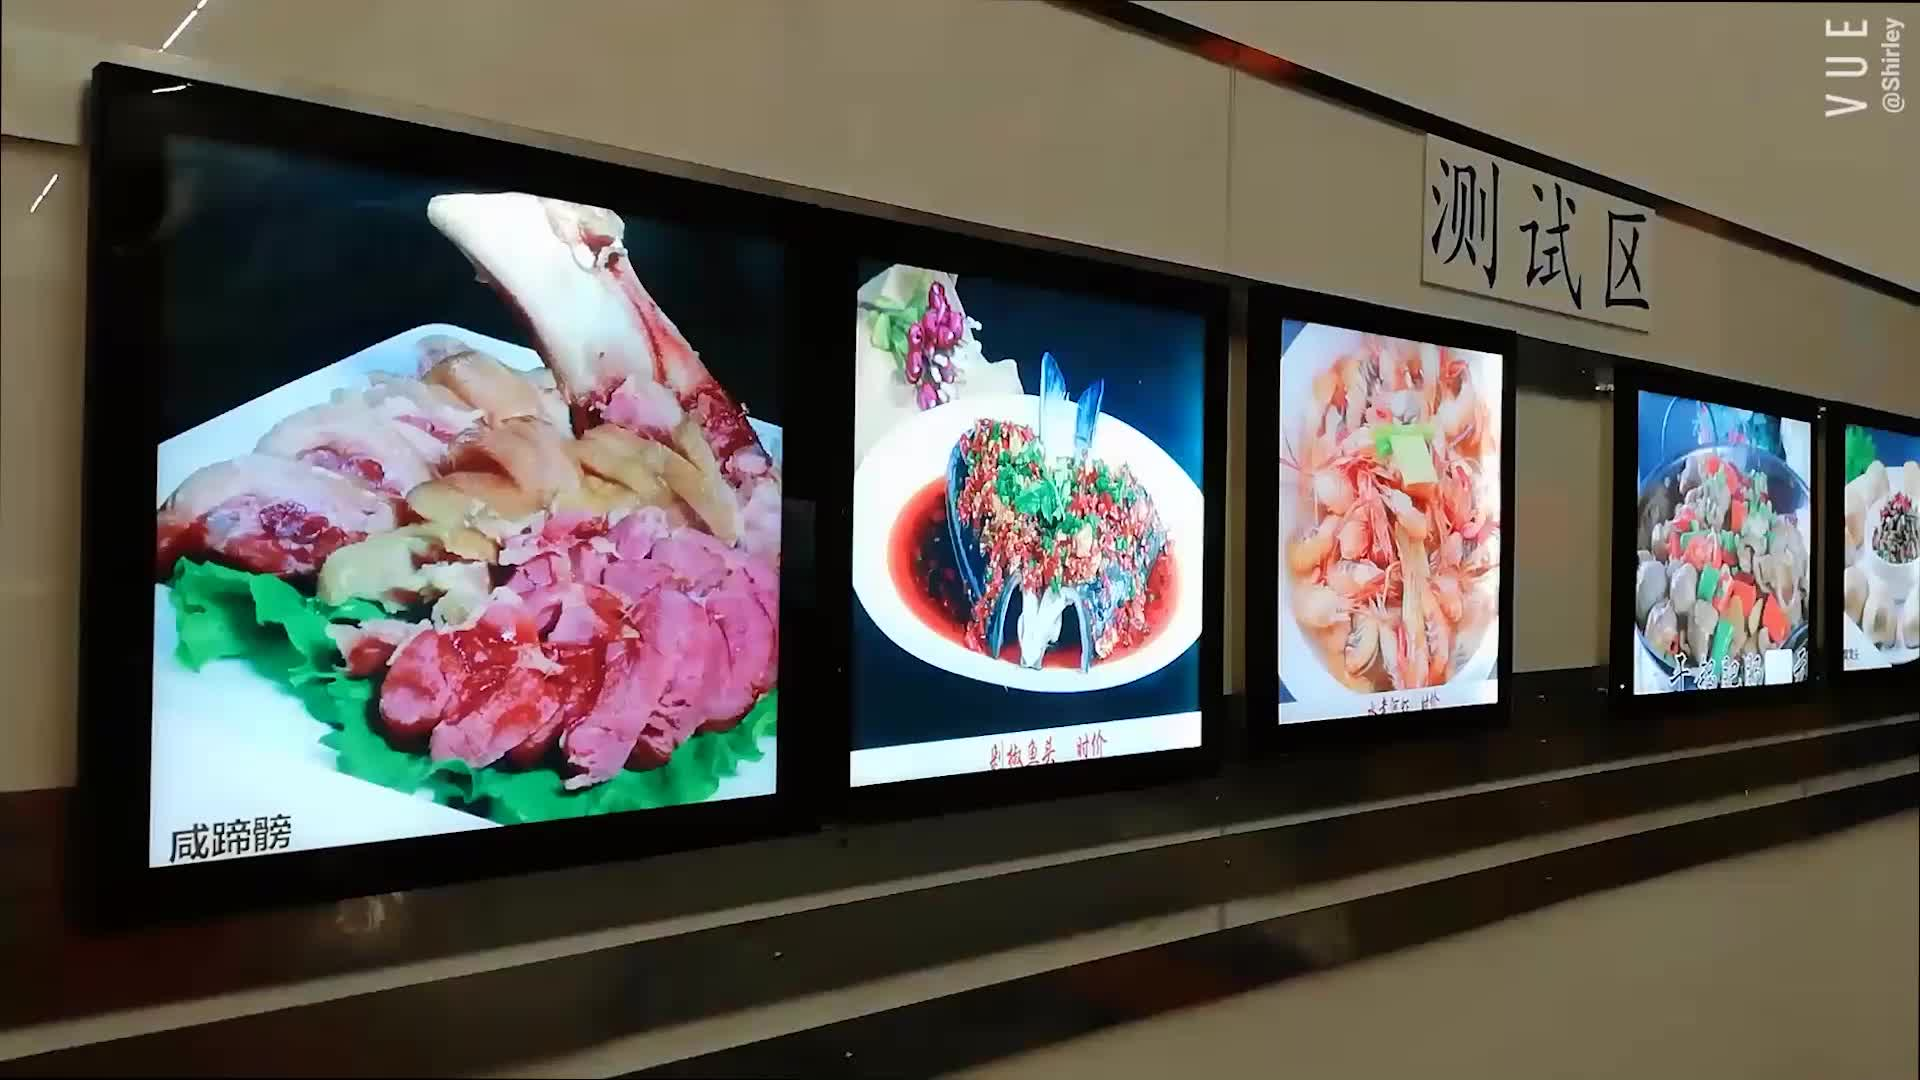 Edgelight foto lichtbak led licht horloge doos menu reclame lichtbak